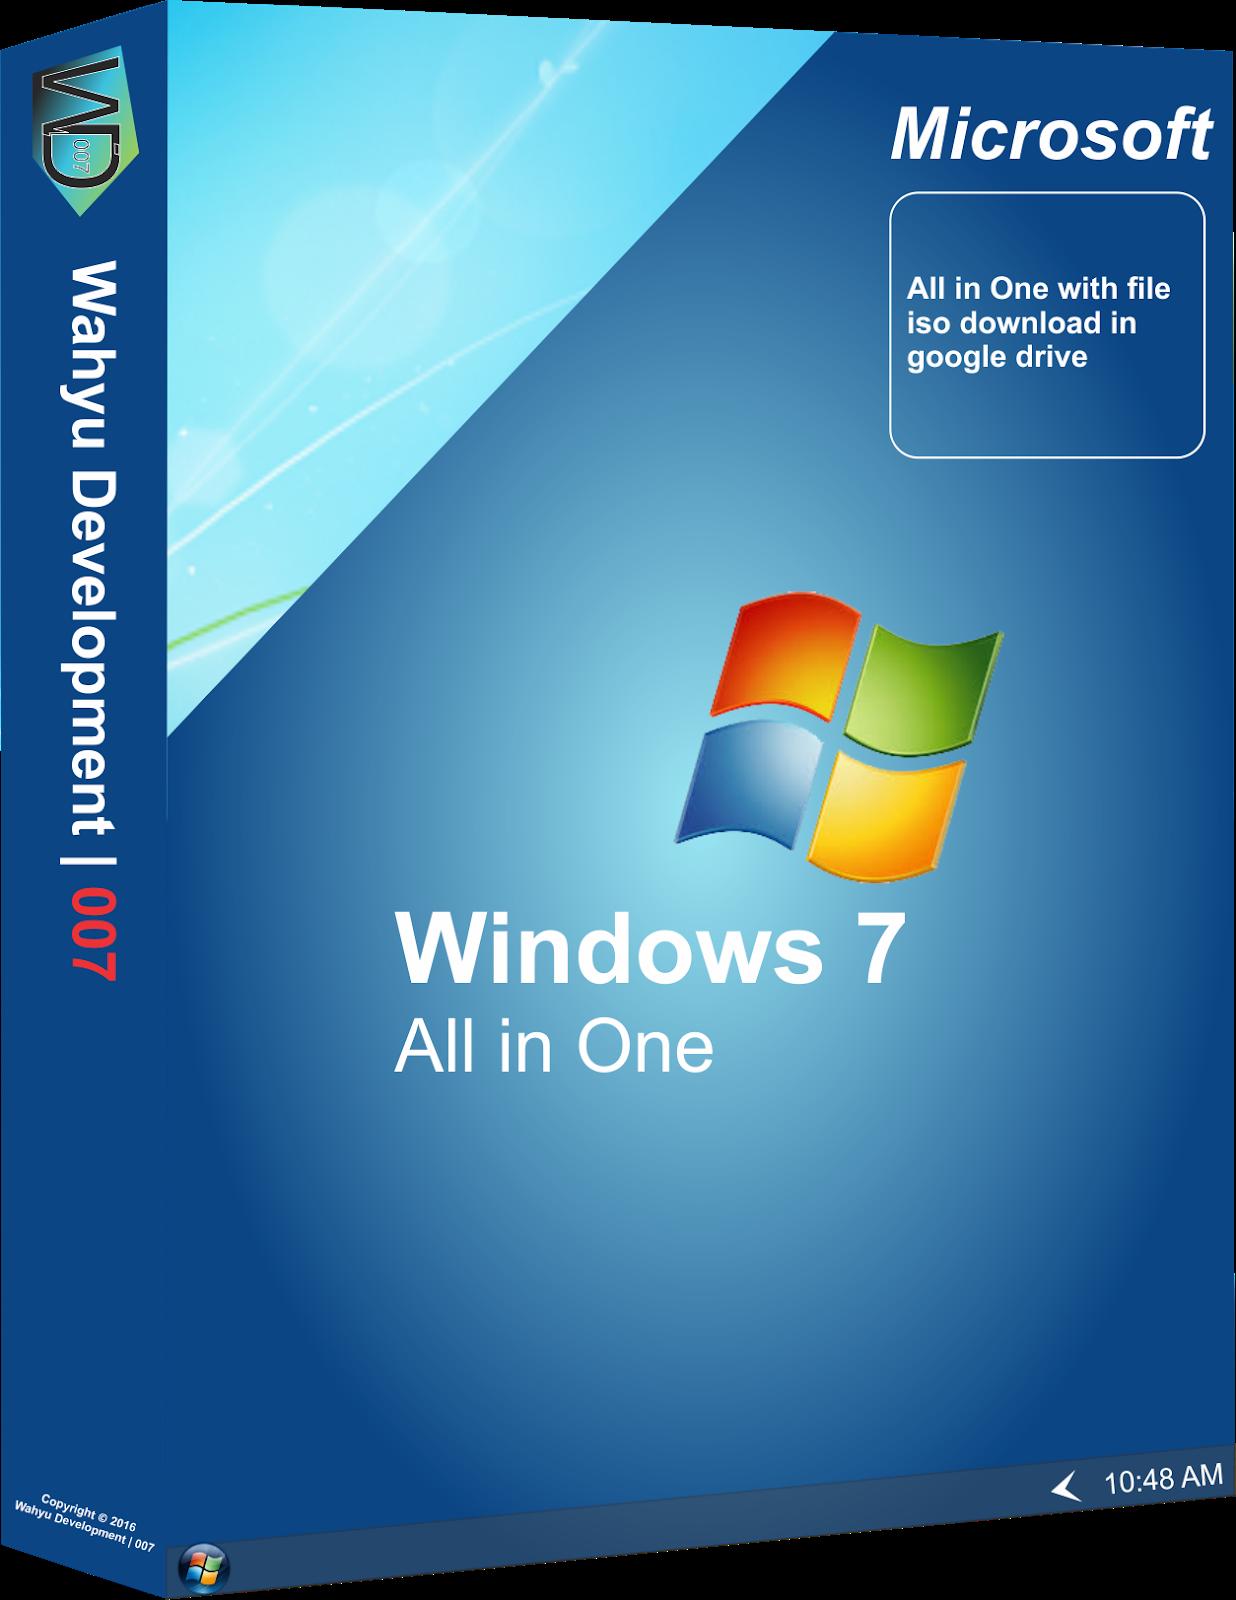 windows 7 iso image google drive